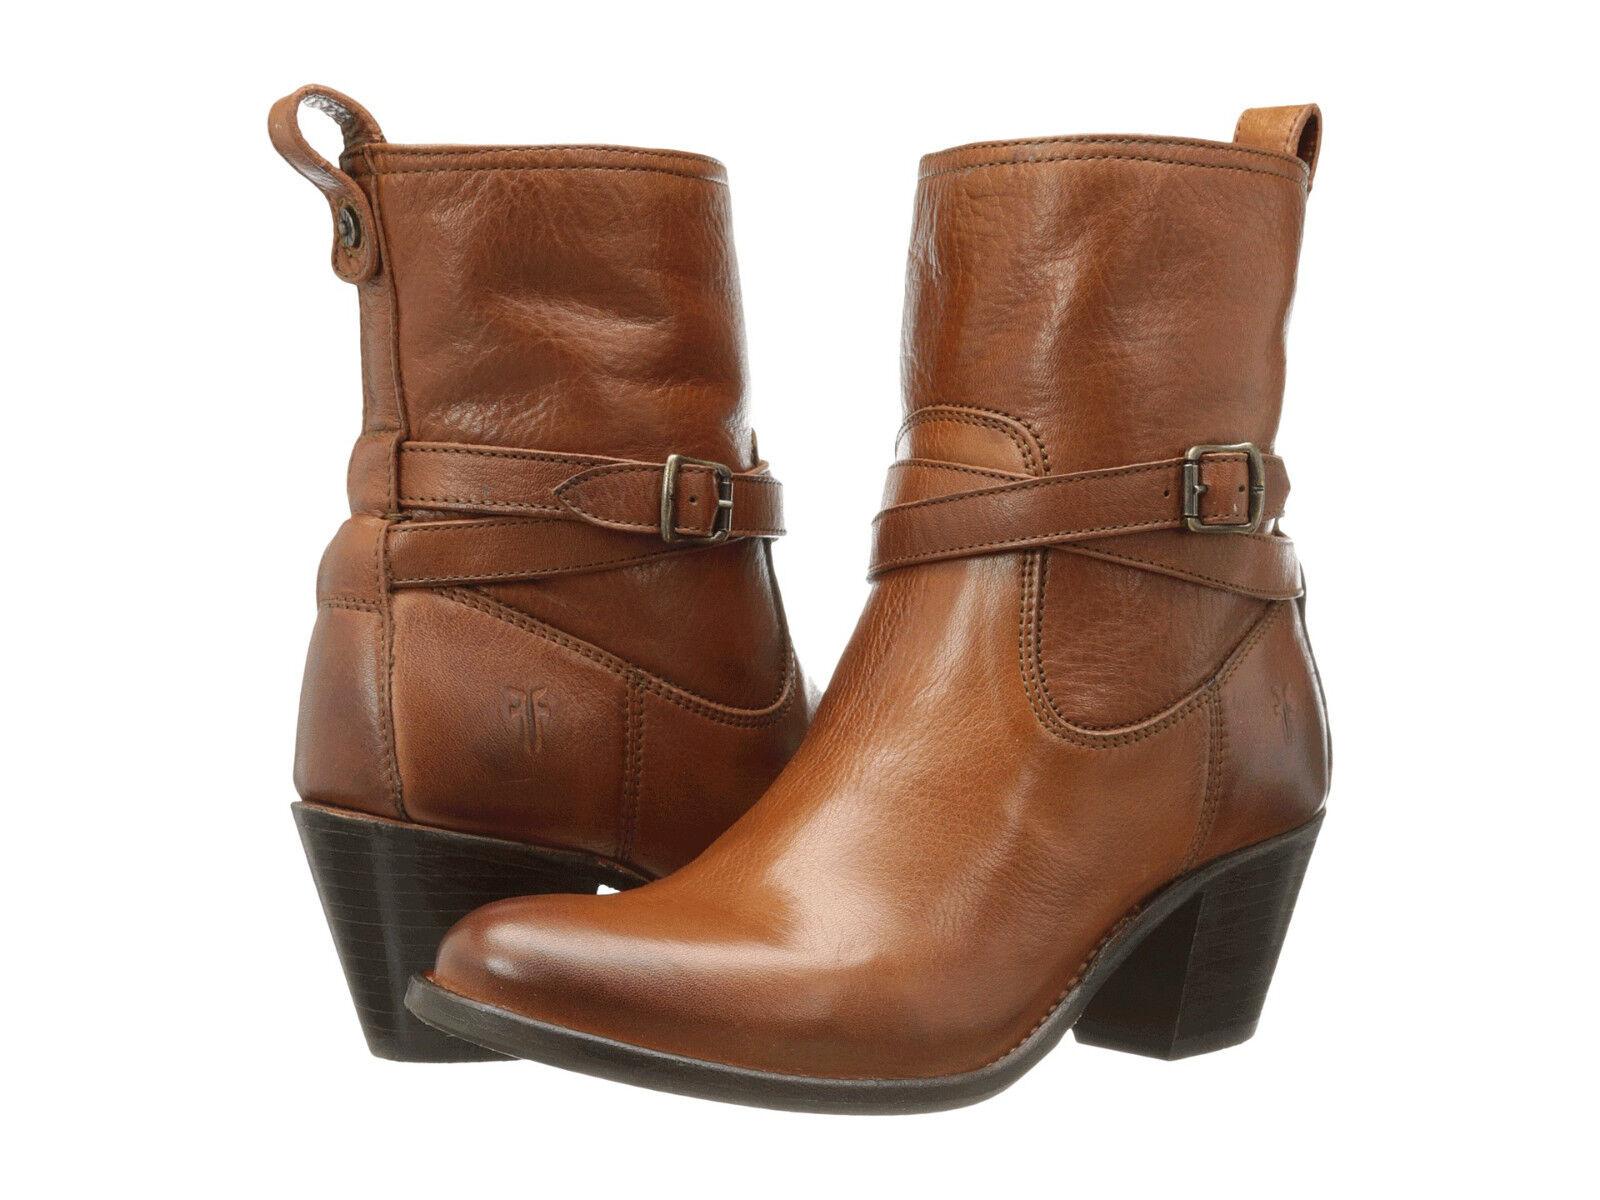 Women's Frye Boots Jackie Rivet Short ZipOn Tan Whiskey Leather 76291 WHS